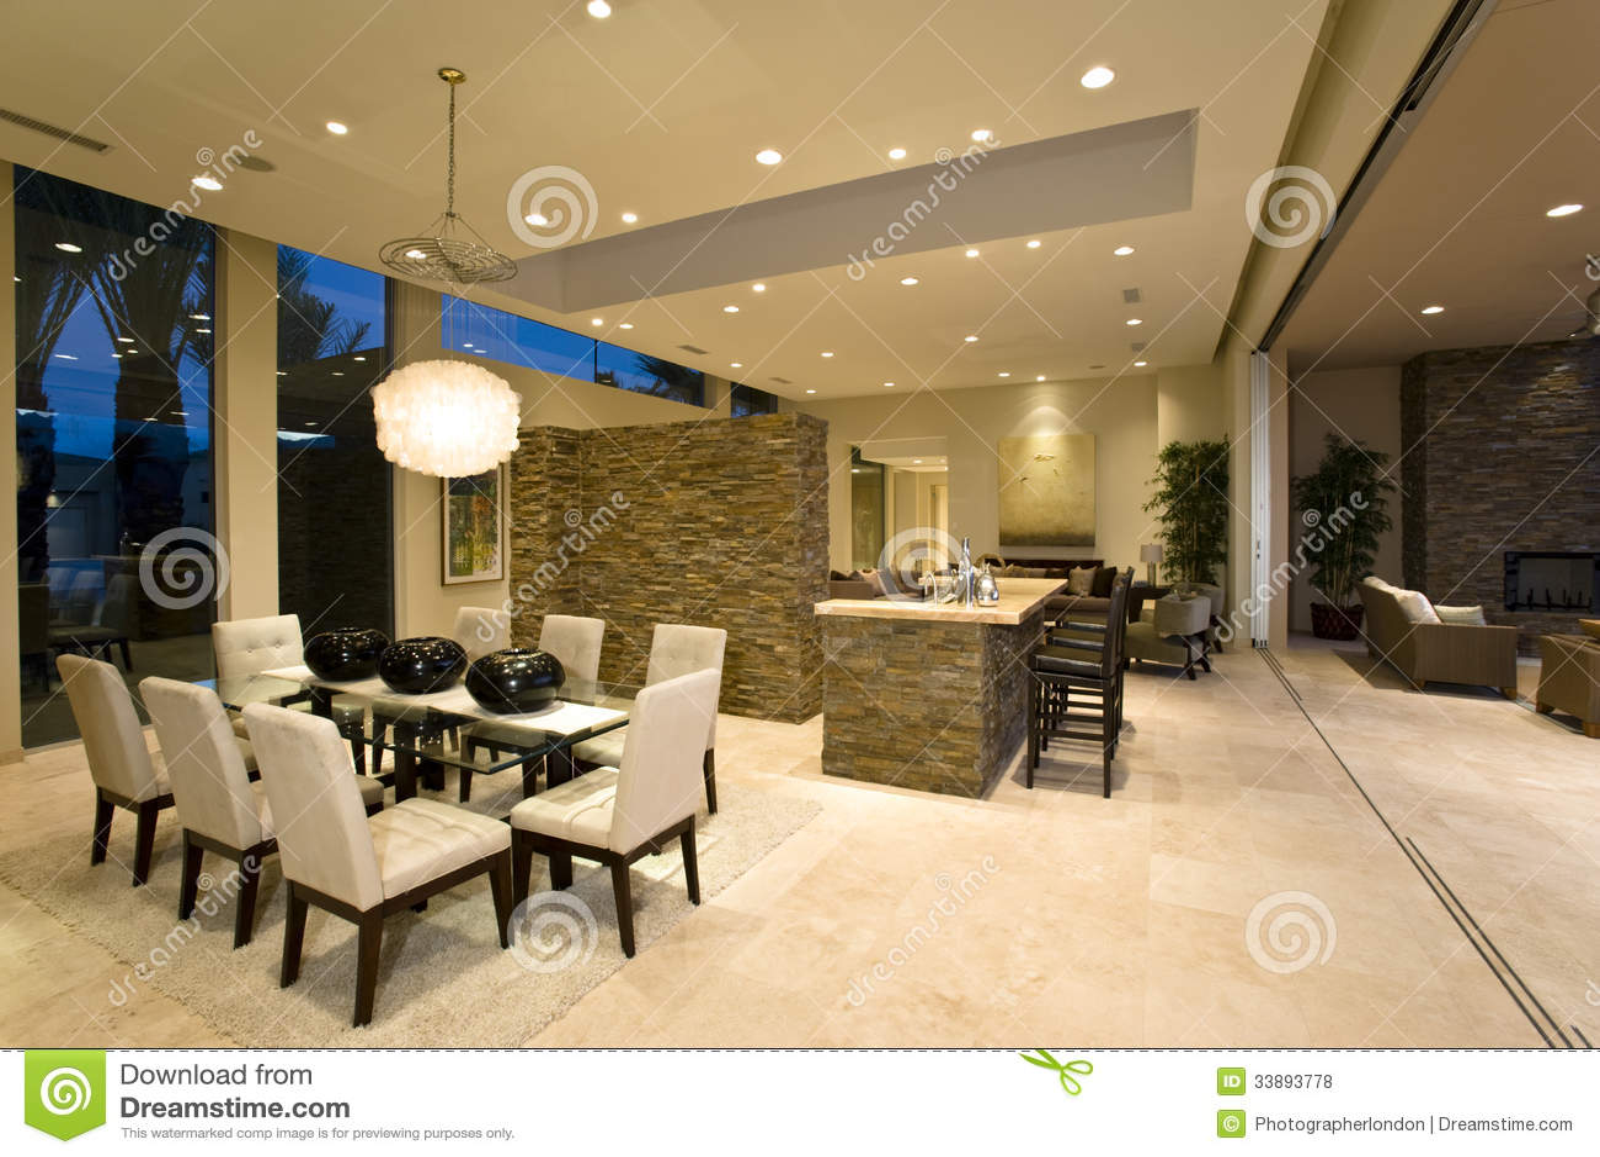 Interieur Maison Moderne Awesome Amenagement With Interieur Maison - Plan interieur maison moderne